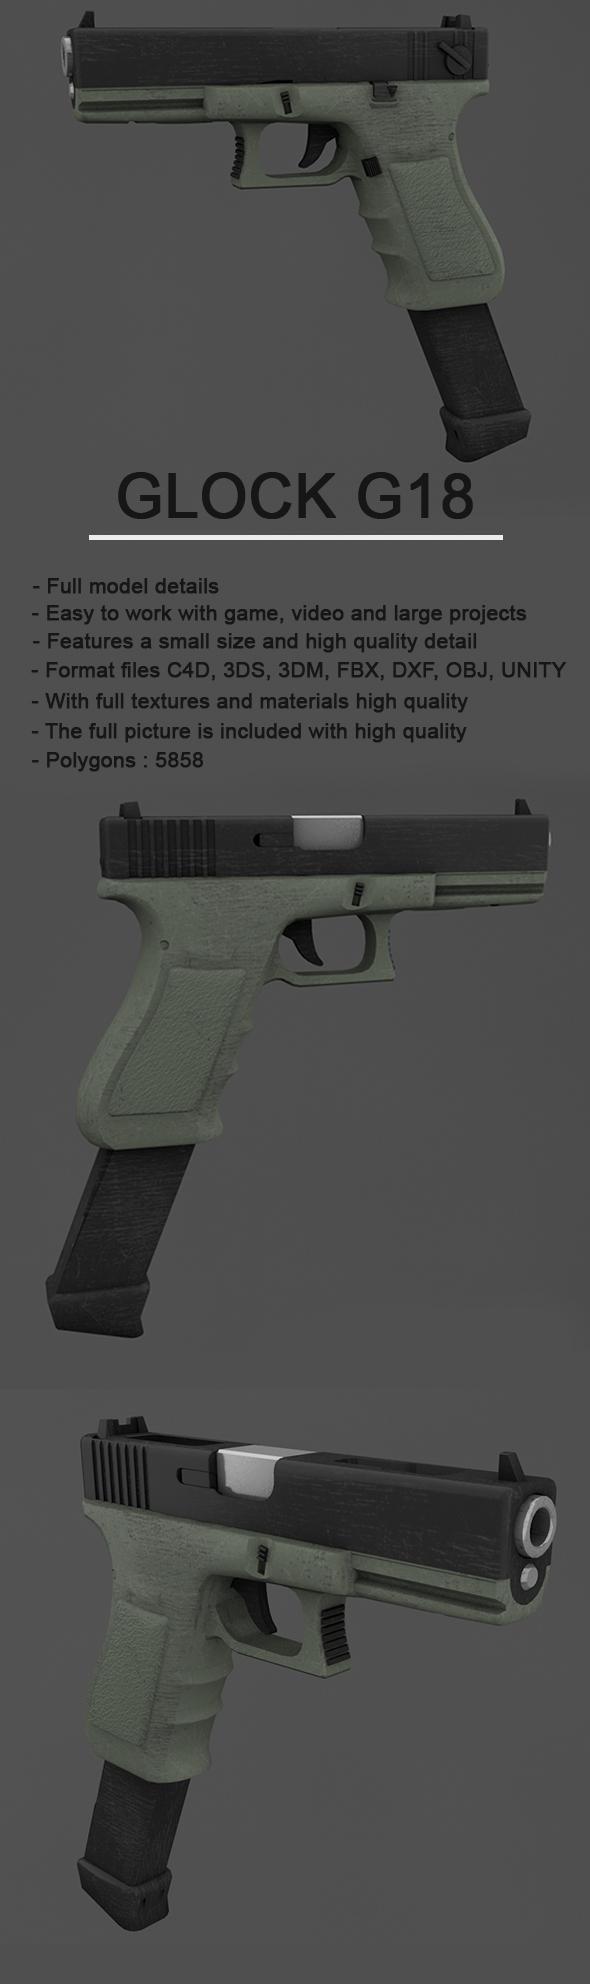 Glock CG Textures & 3D Models from 3DOcean